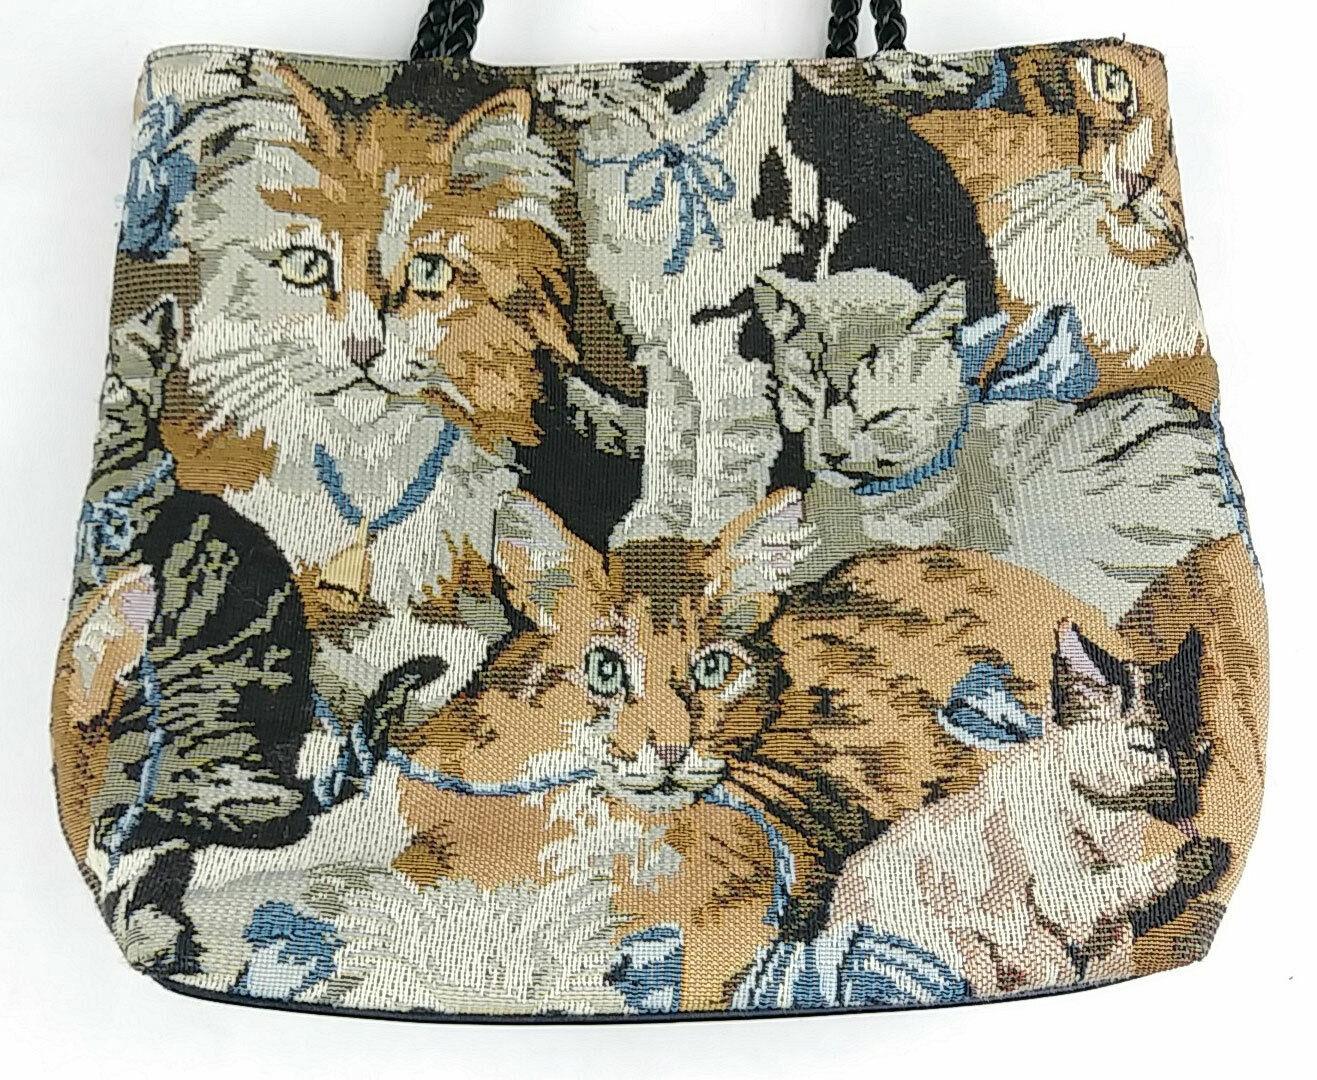 Bueno Cat Kittens Tapestry Shoulder Bag - image 2